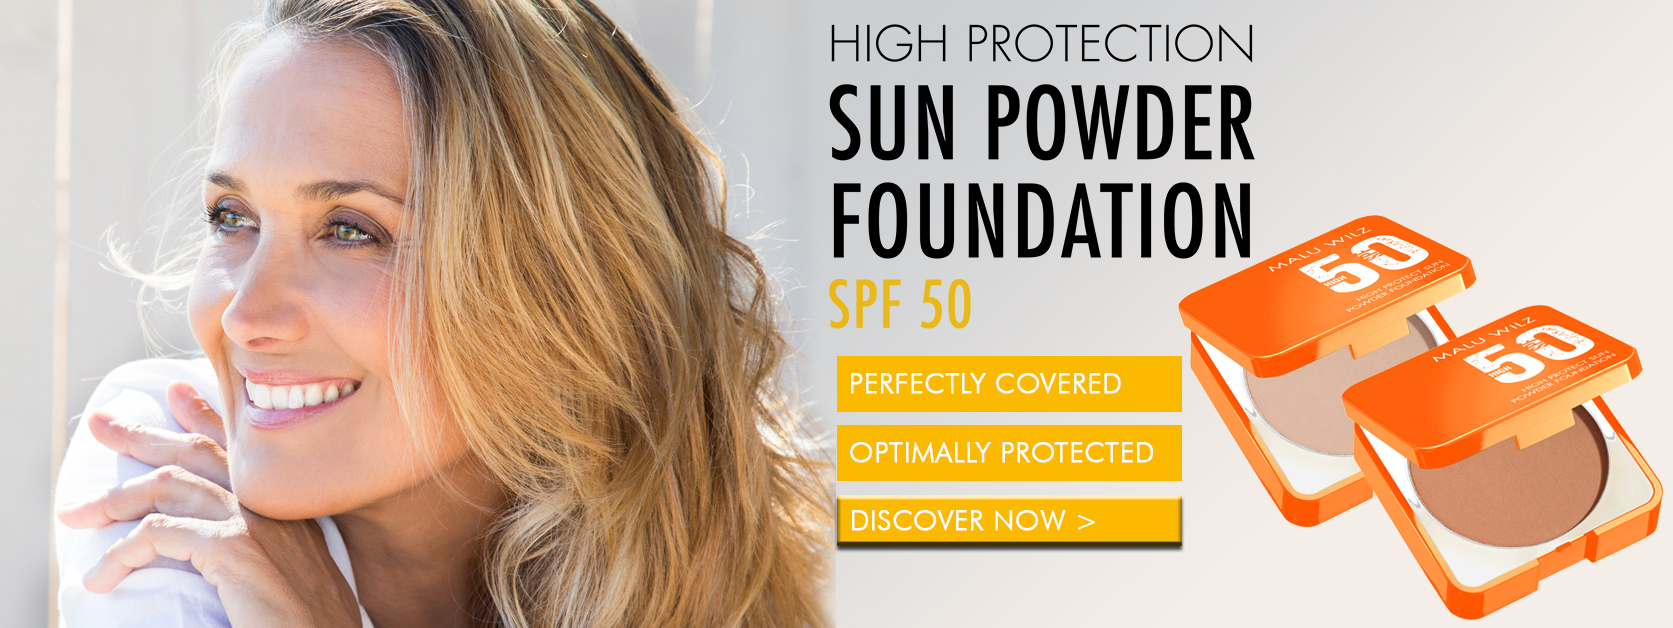 Woman with Sun Powder